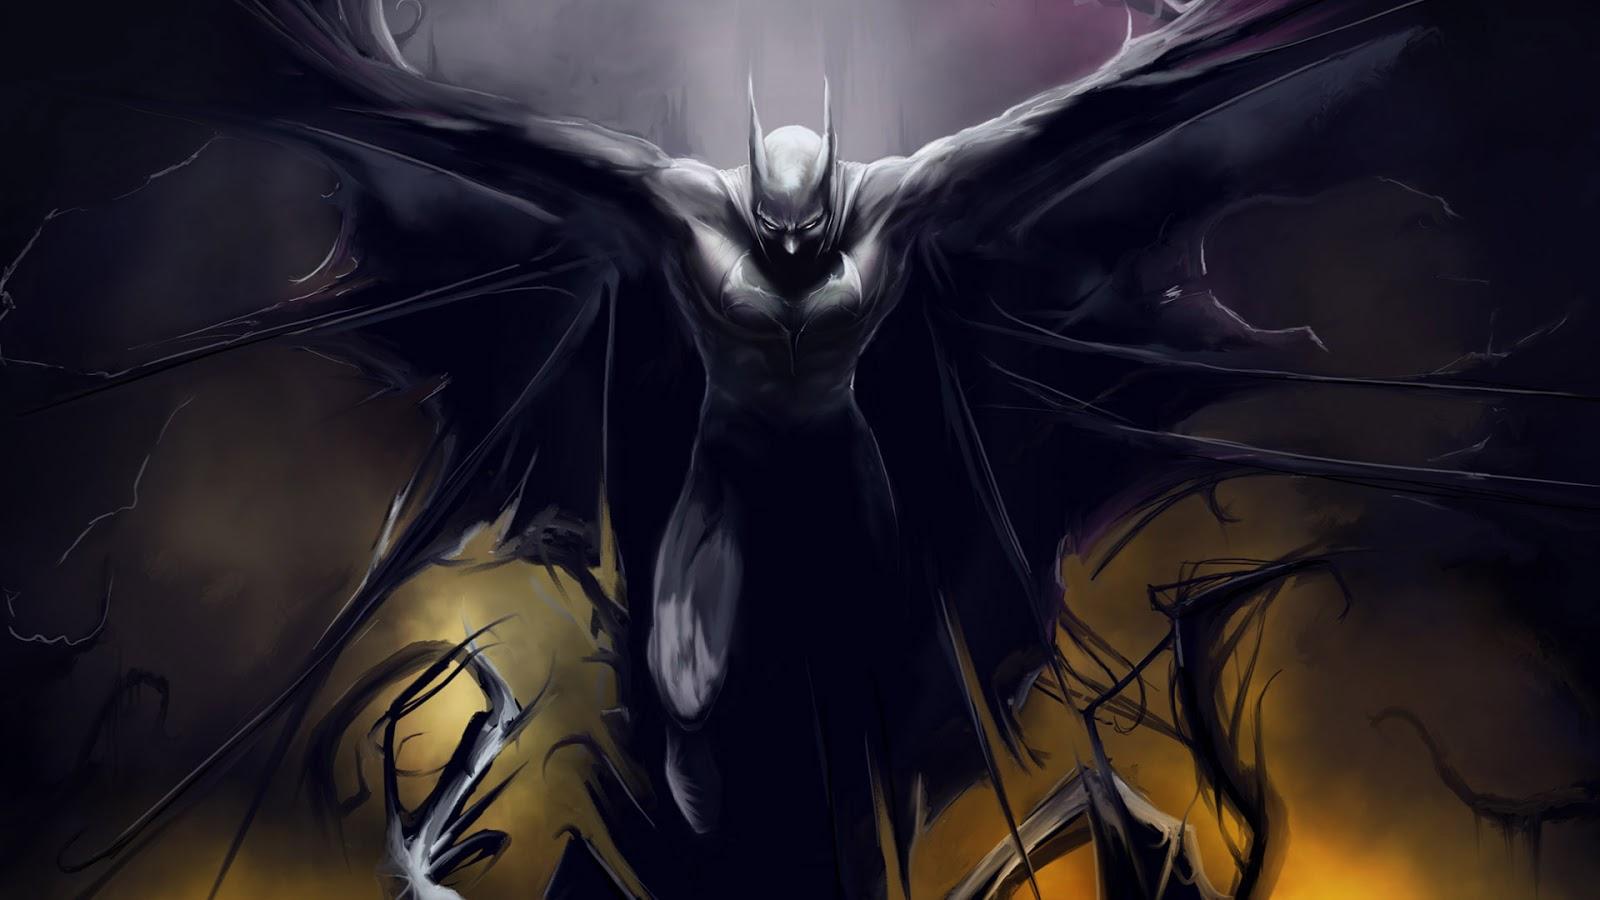 Evil Batman Monster Wallpaper for Desktop | Download ...